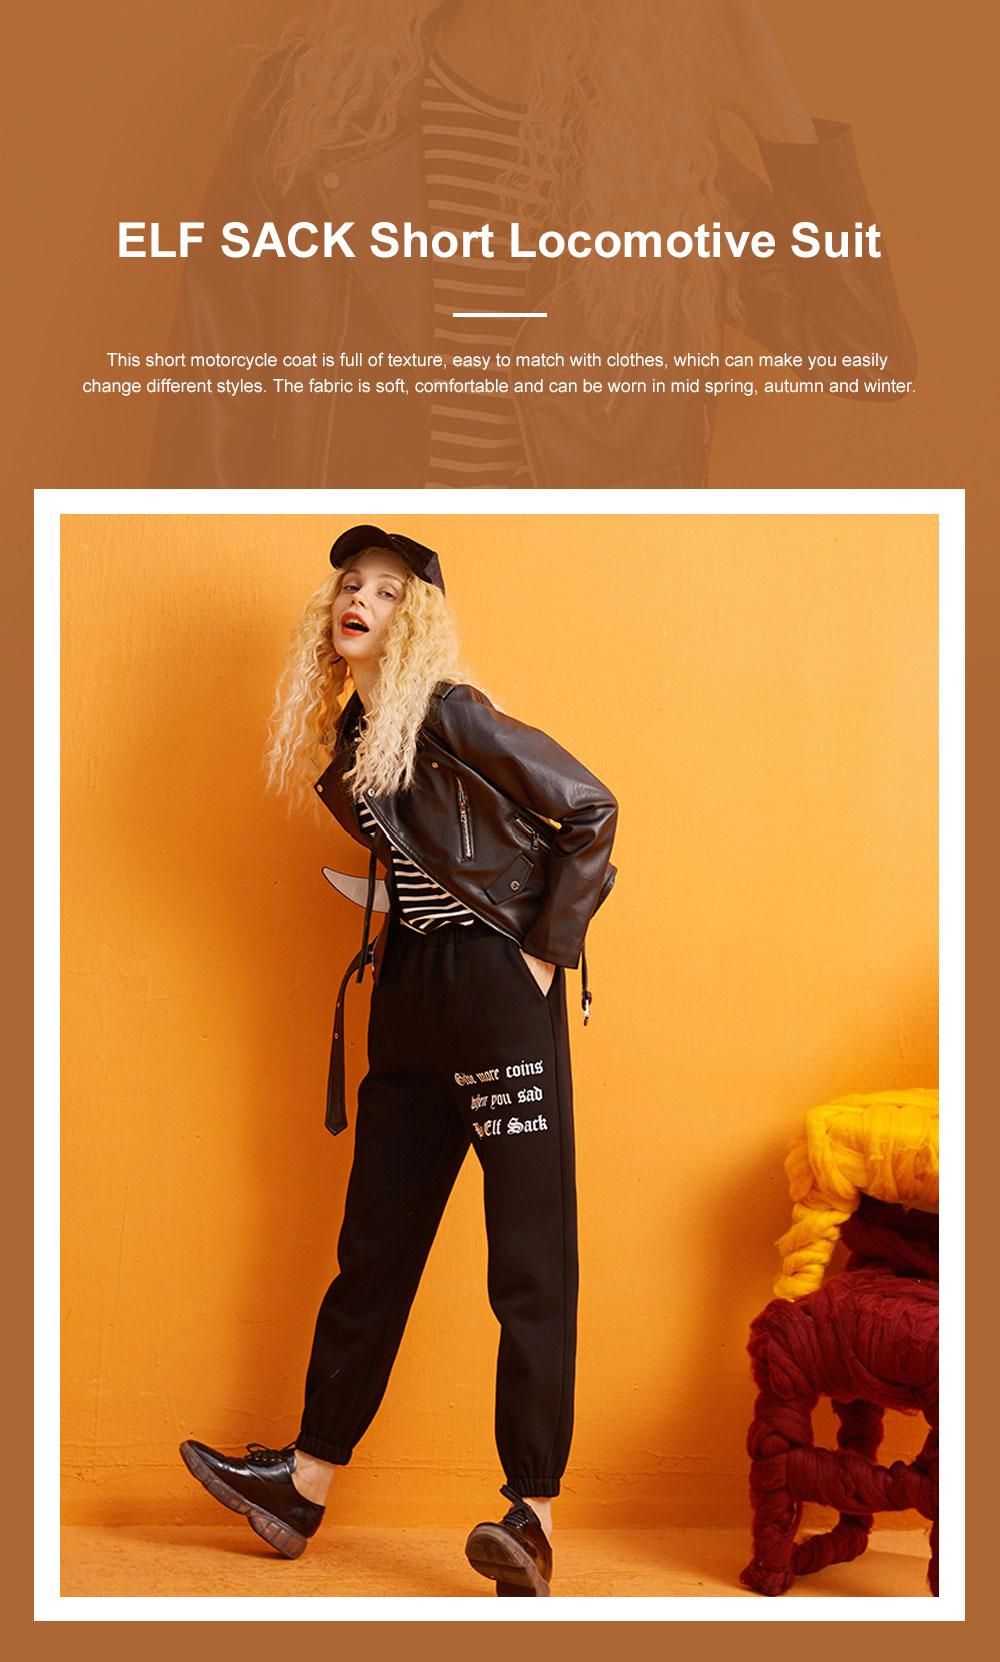 ELFSACK Short Locomotive Suit New Retro Loose Black PU Leather Top in Autumn 2019 Girls' Top Coat 0